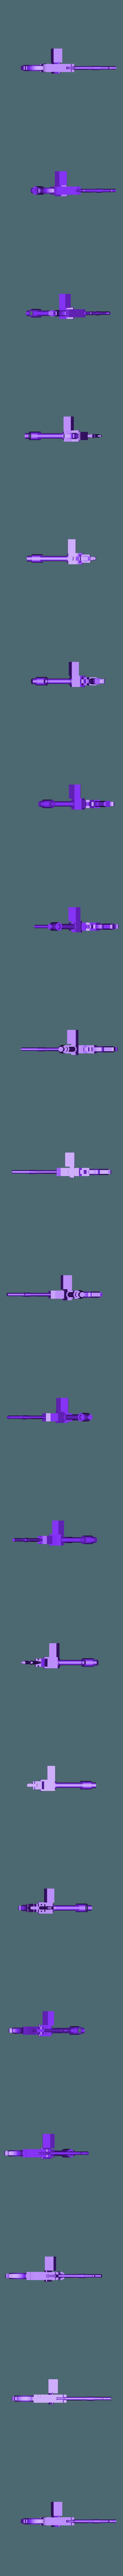 machinegun1.stl Download STL file HUMMER H1 - Assembly model kit 1:35 • 3D print model, guillesilvestrini